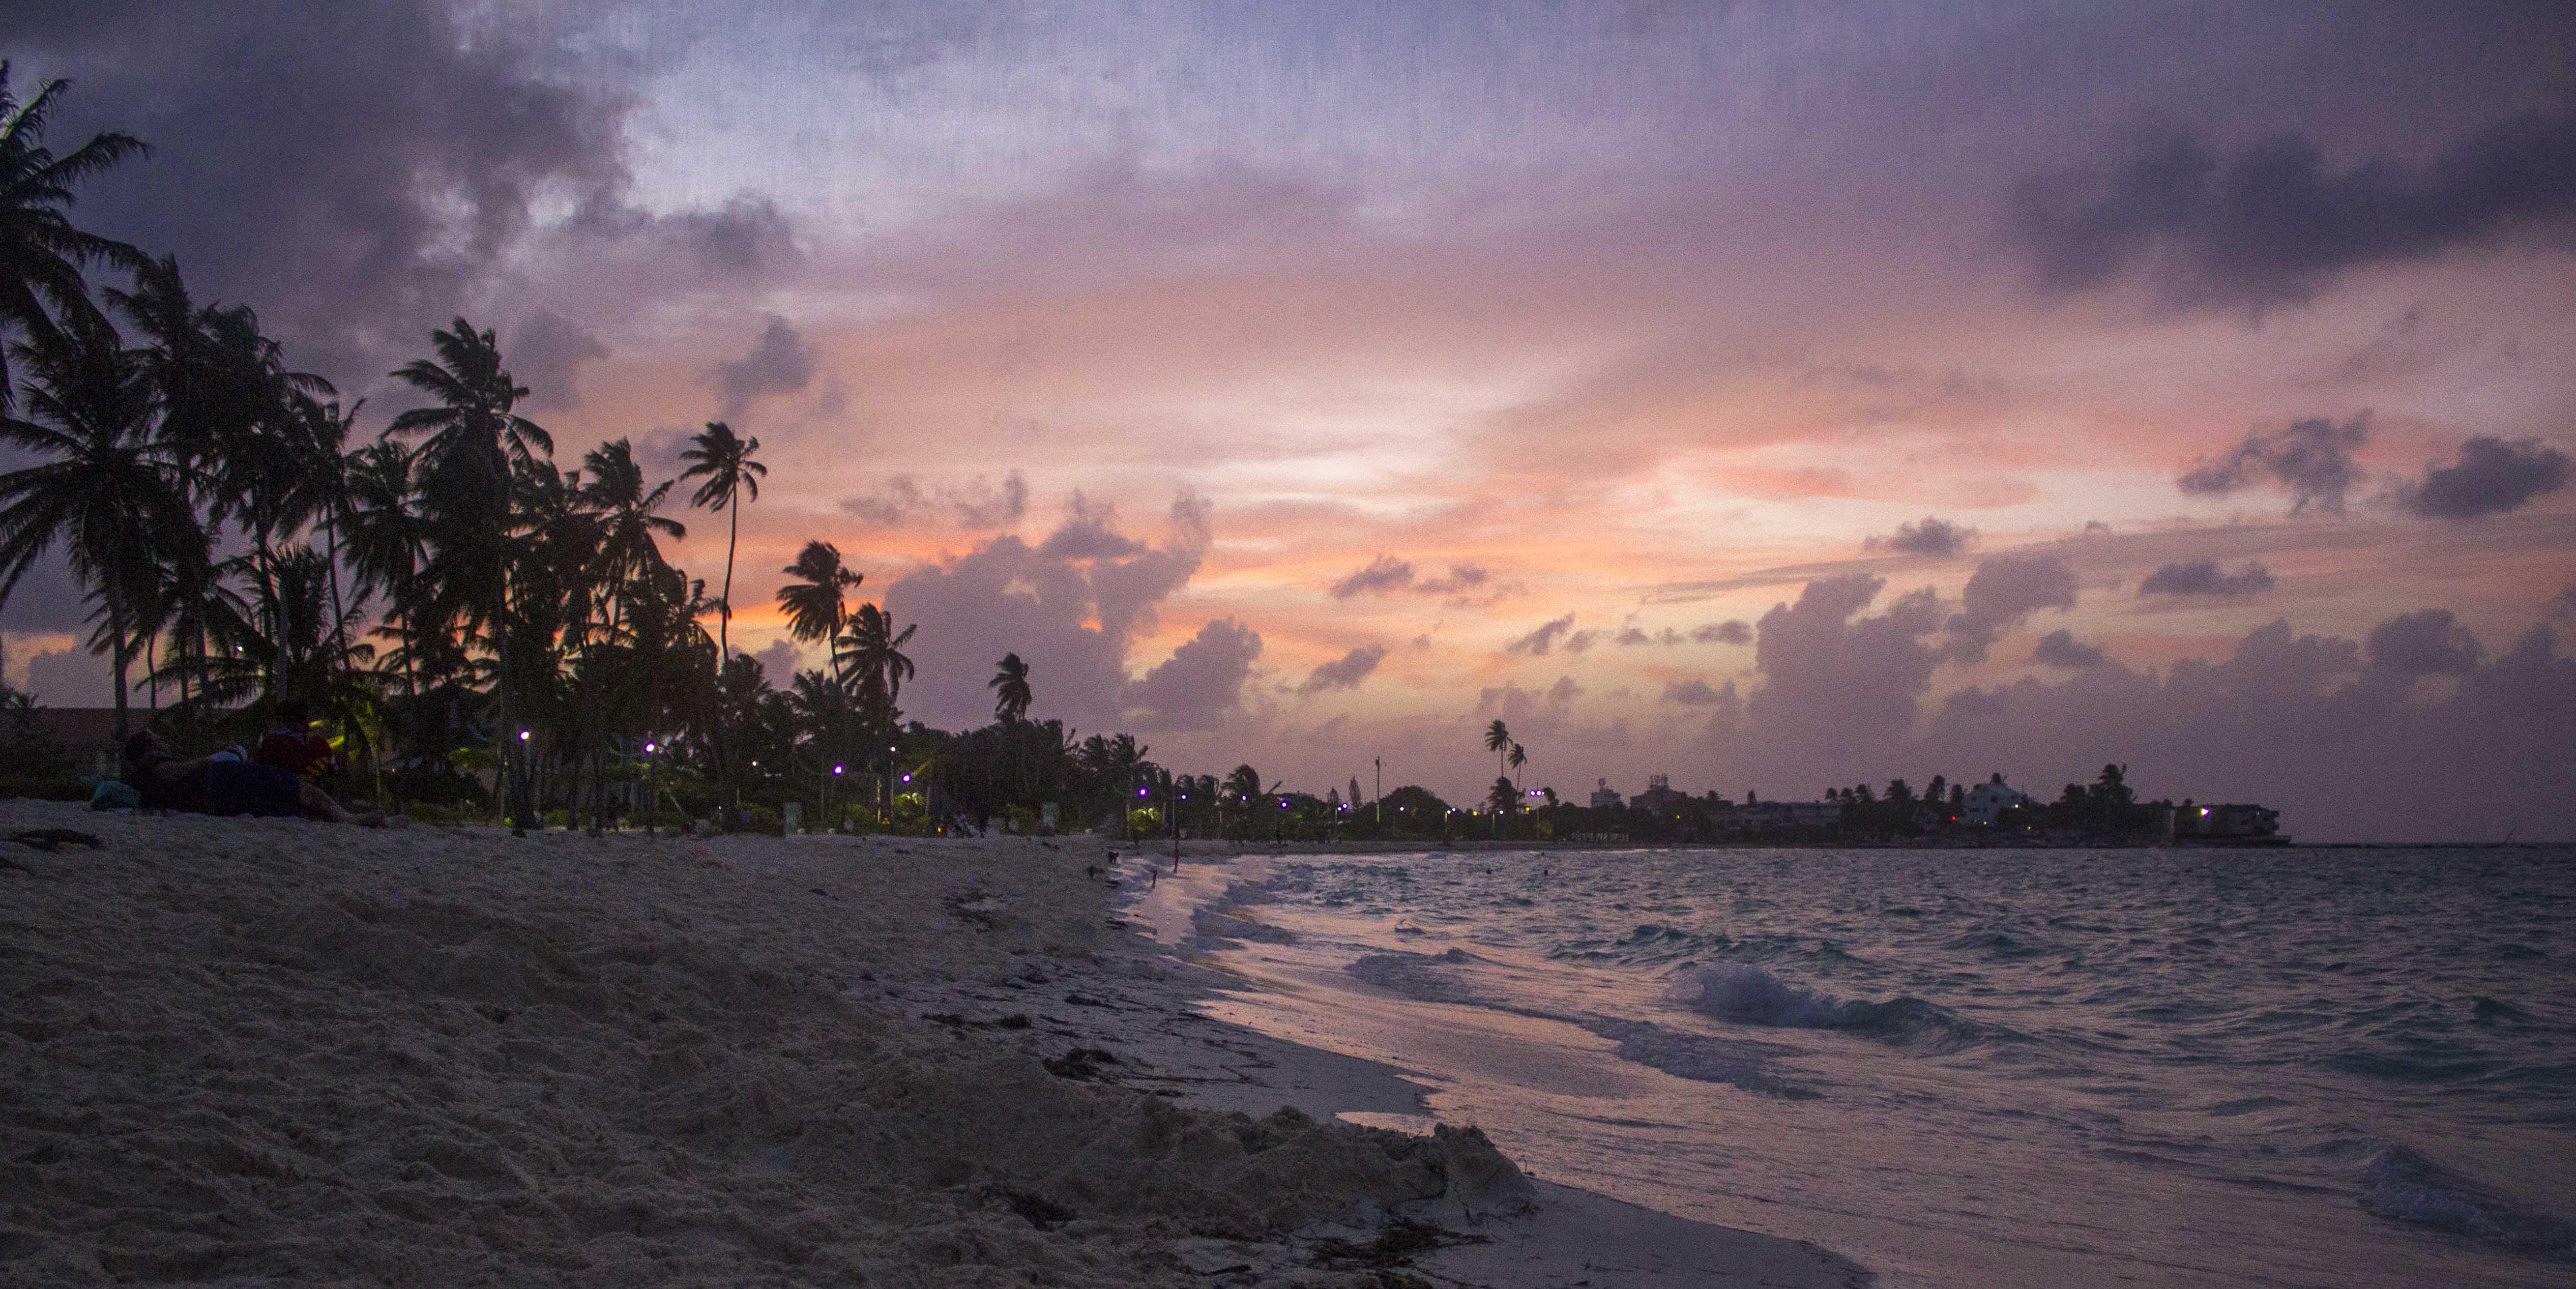 san andres island guide: spratt bright beach at sunset